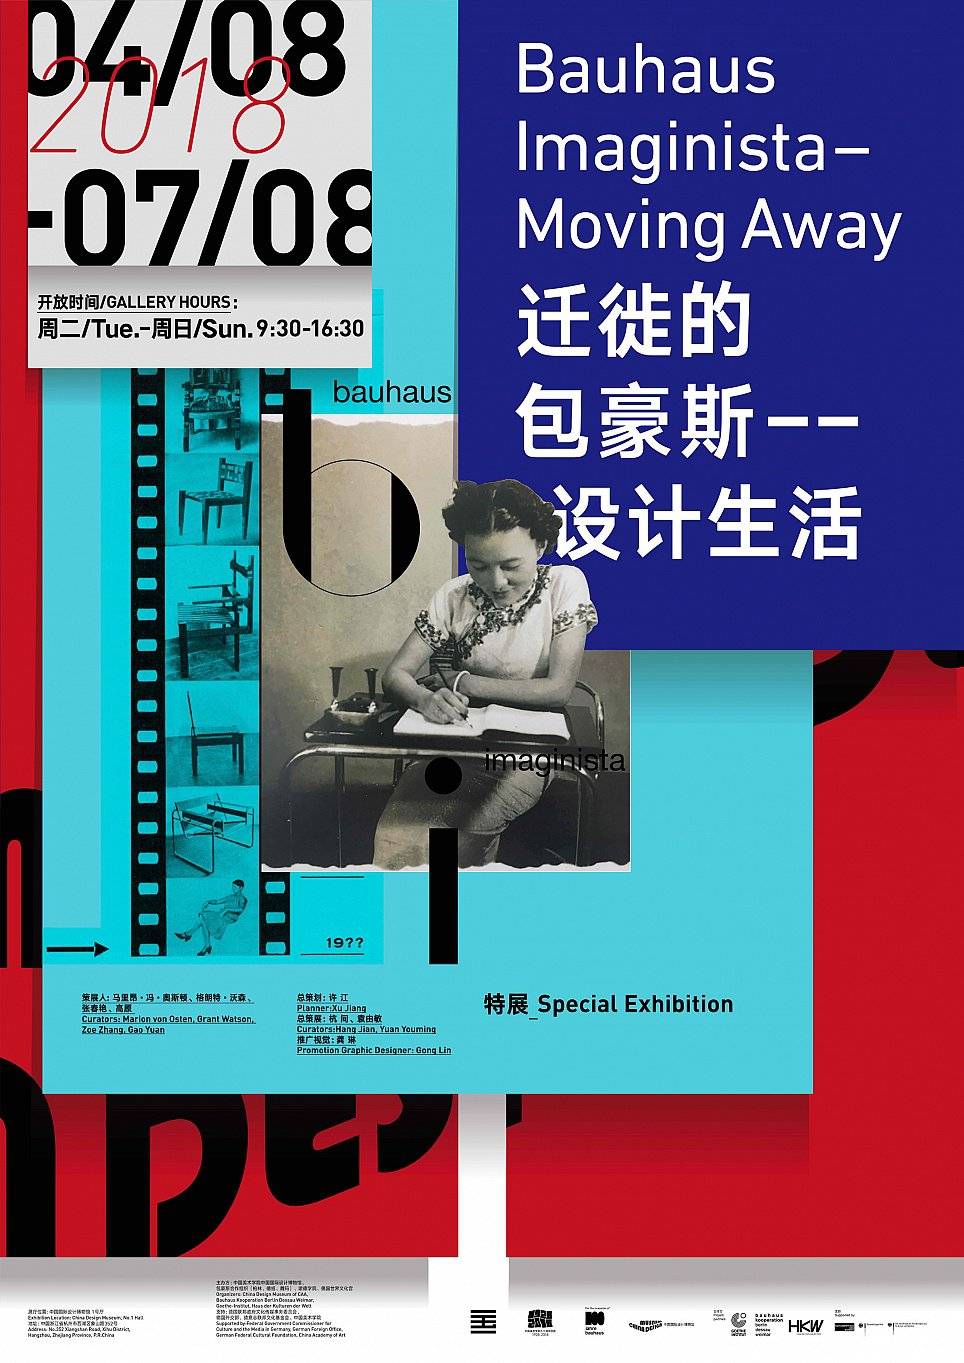 bauhaus imaginsta: Moving Away, Hangzhou